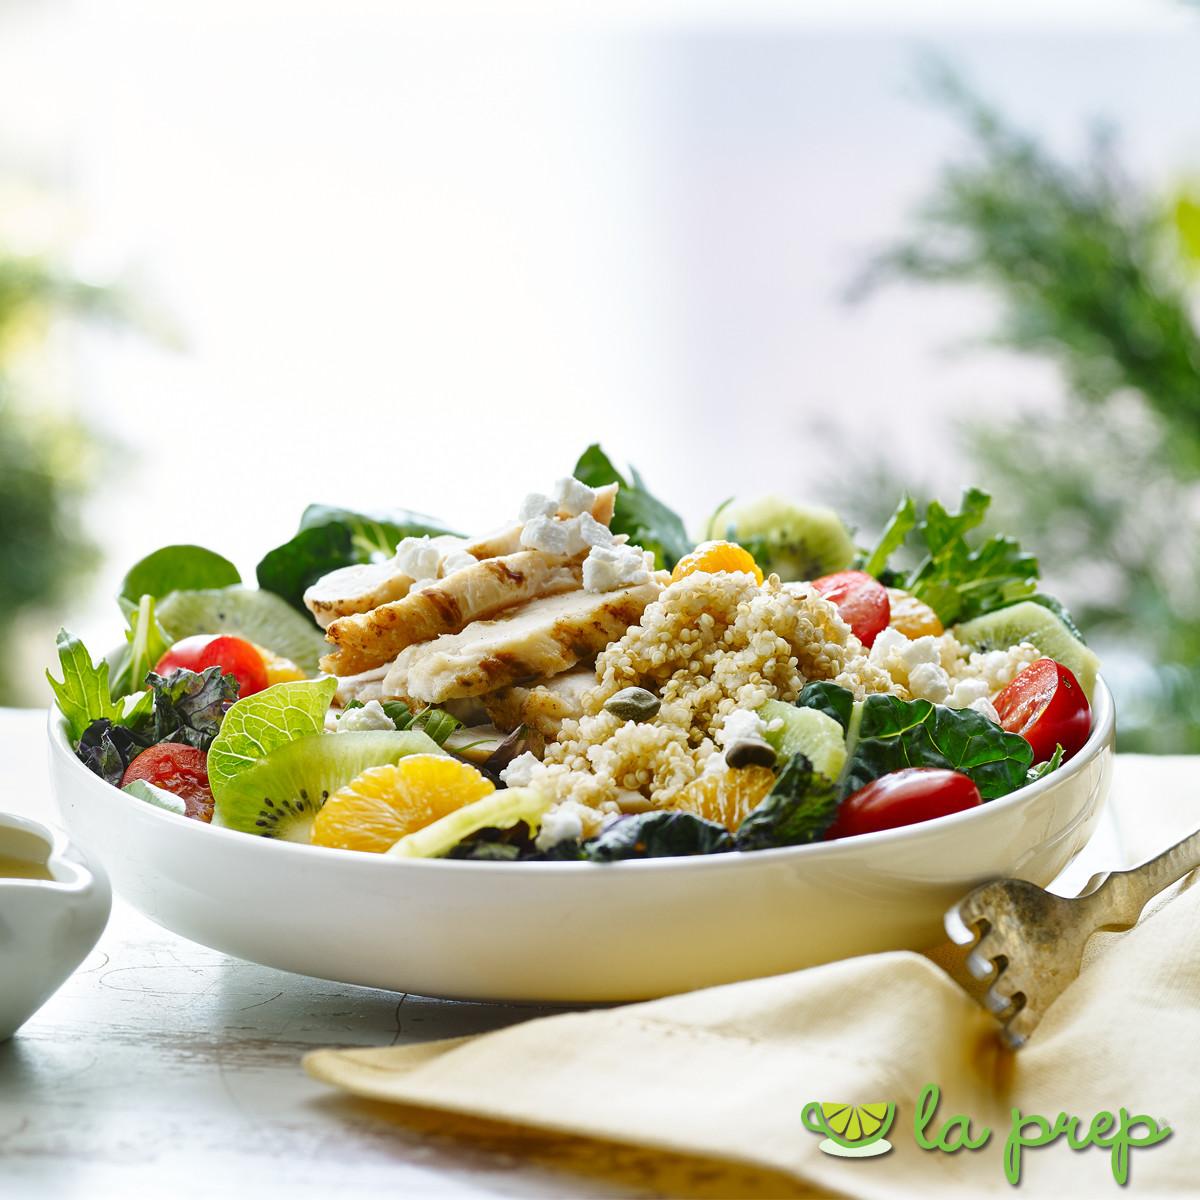 Tropical Chicken and Quinoa Salad